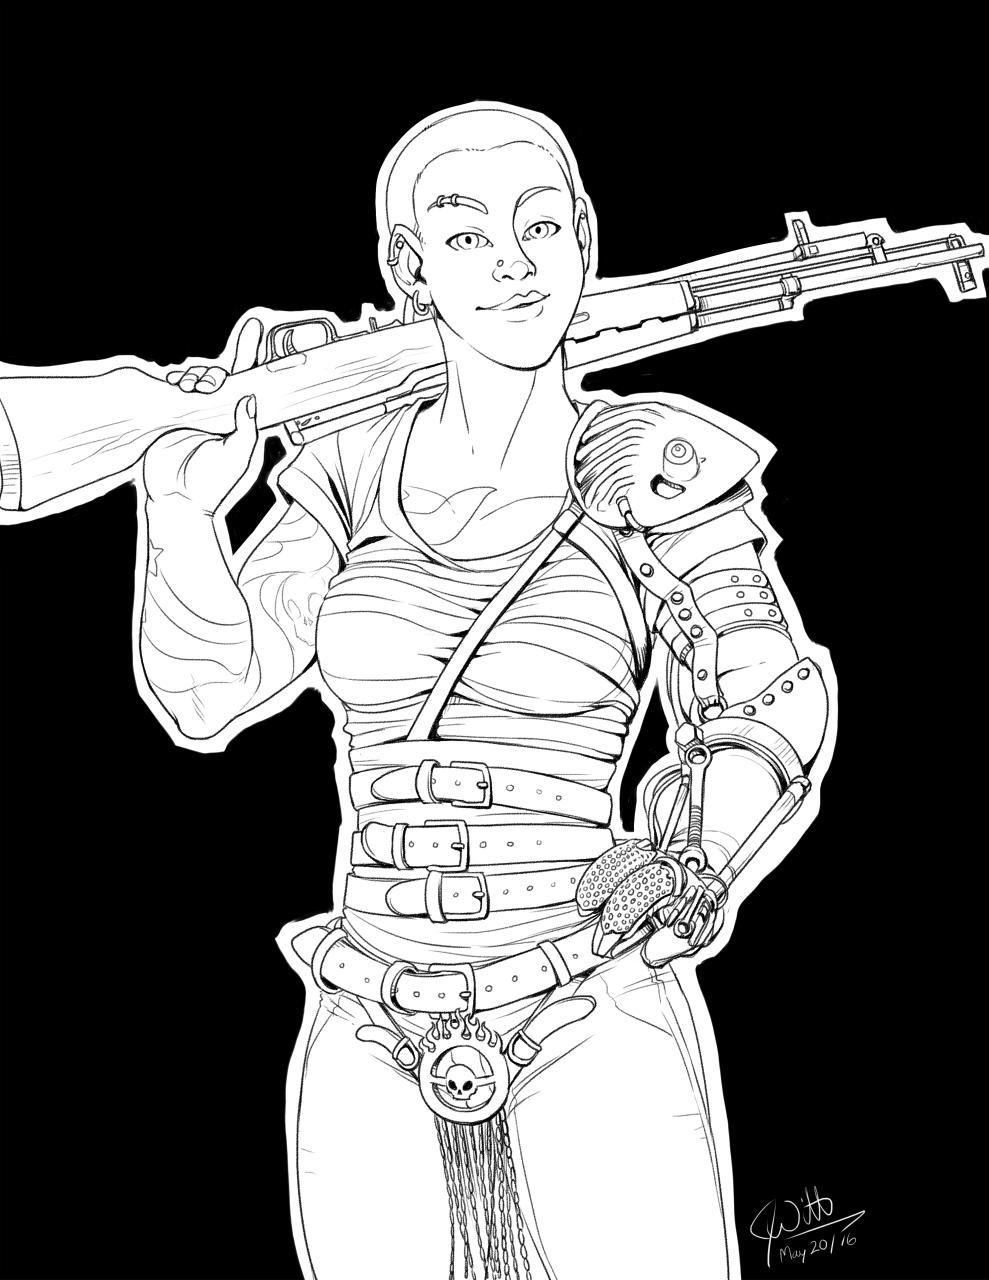 Inked Cosplay - Kara as Furiosa